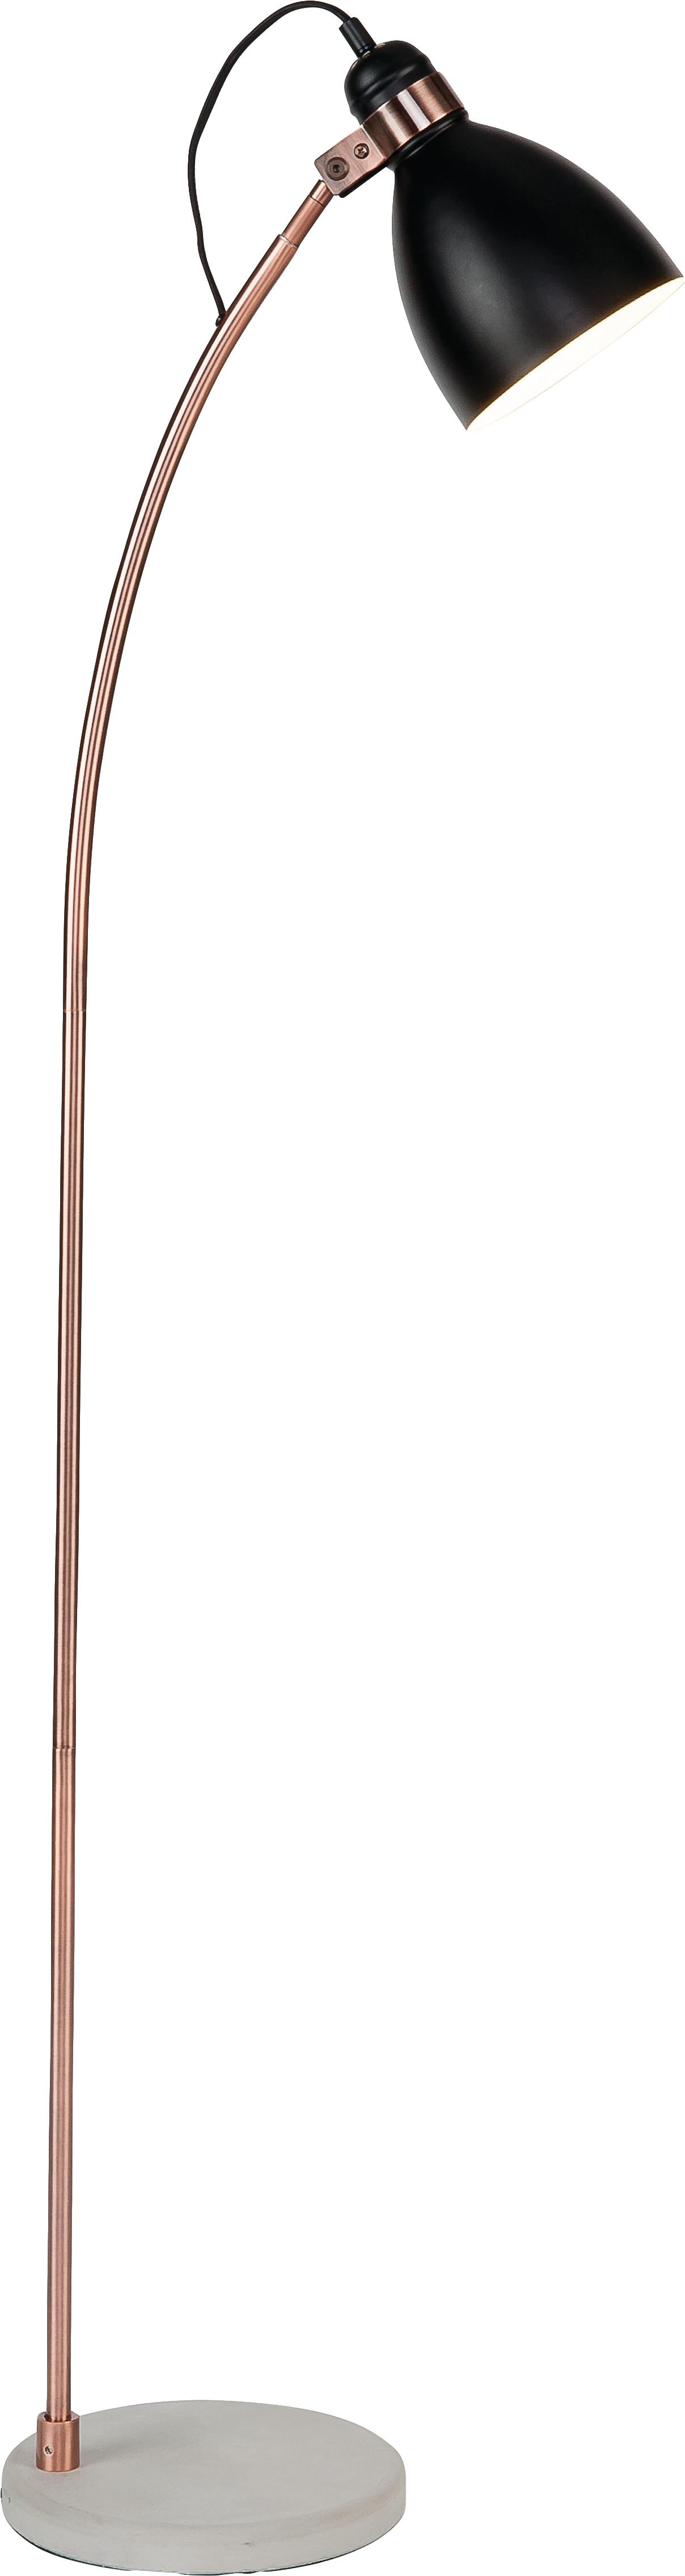 Vloerlamp Denver met betonnen voet, Lampenkap: bekleed ijzer, Frame: verkoperd ijzer, Lampvoet: beton, Lampenkap: zwart. Stang: koperkleurig. Lampvoet: cementkleurig, 37 x 145 cm